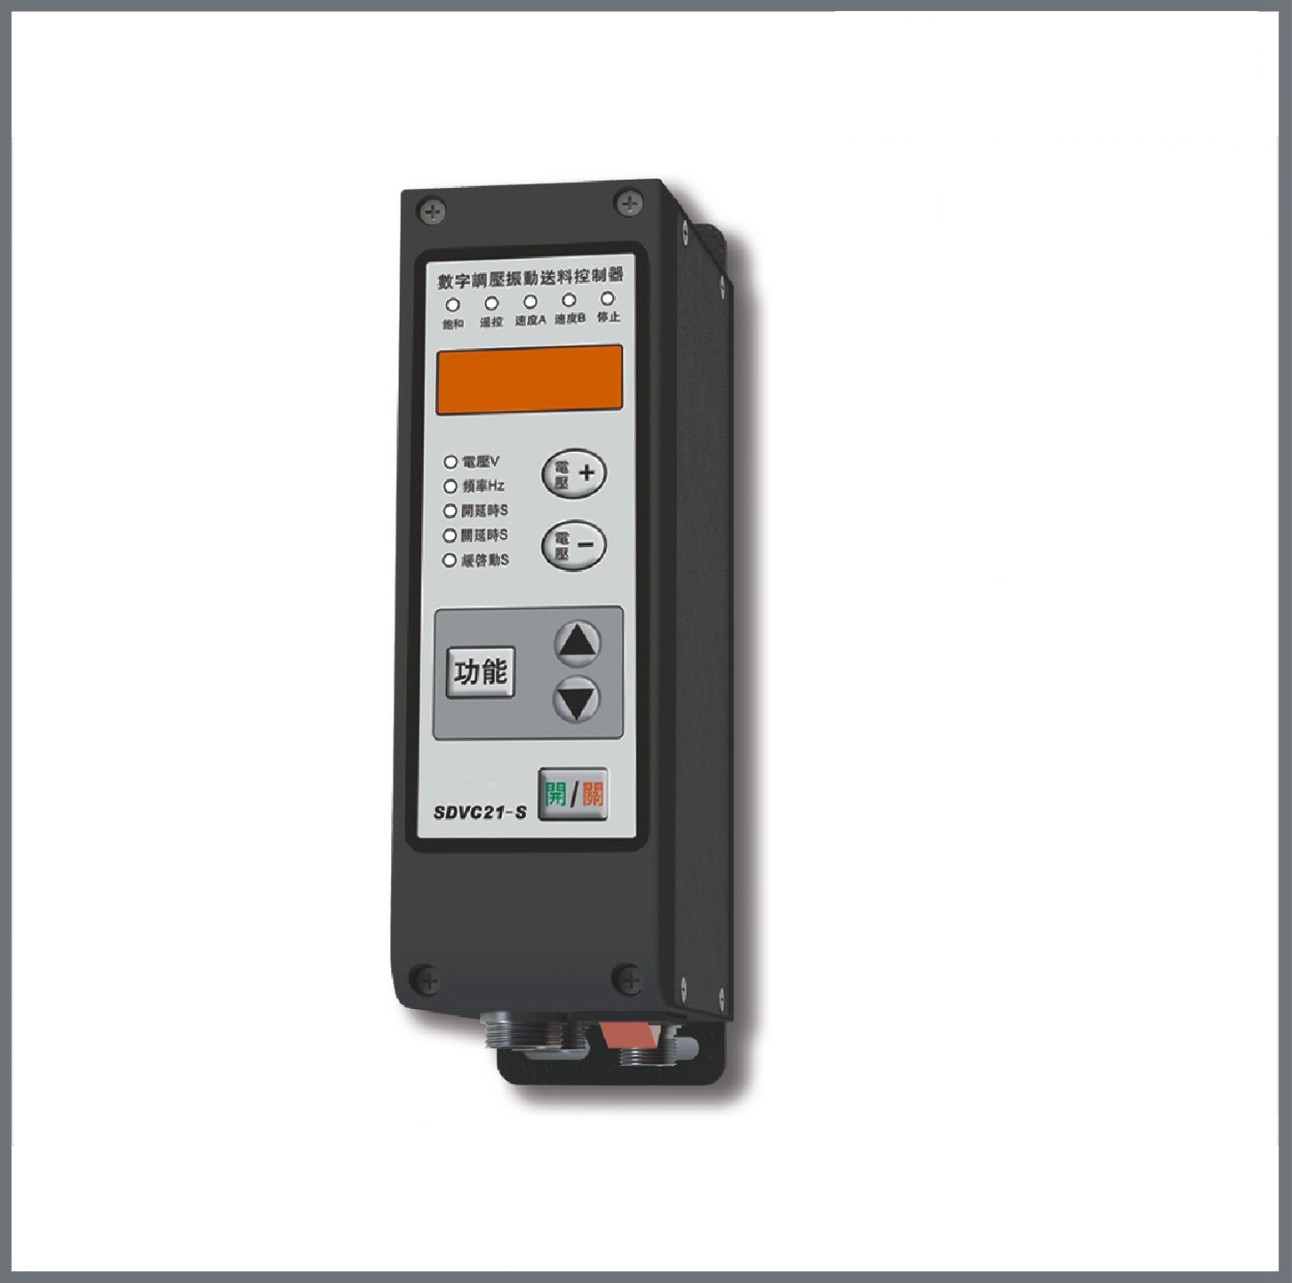 SDVC21-S (5A) 数字调压振动送料控制器